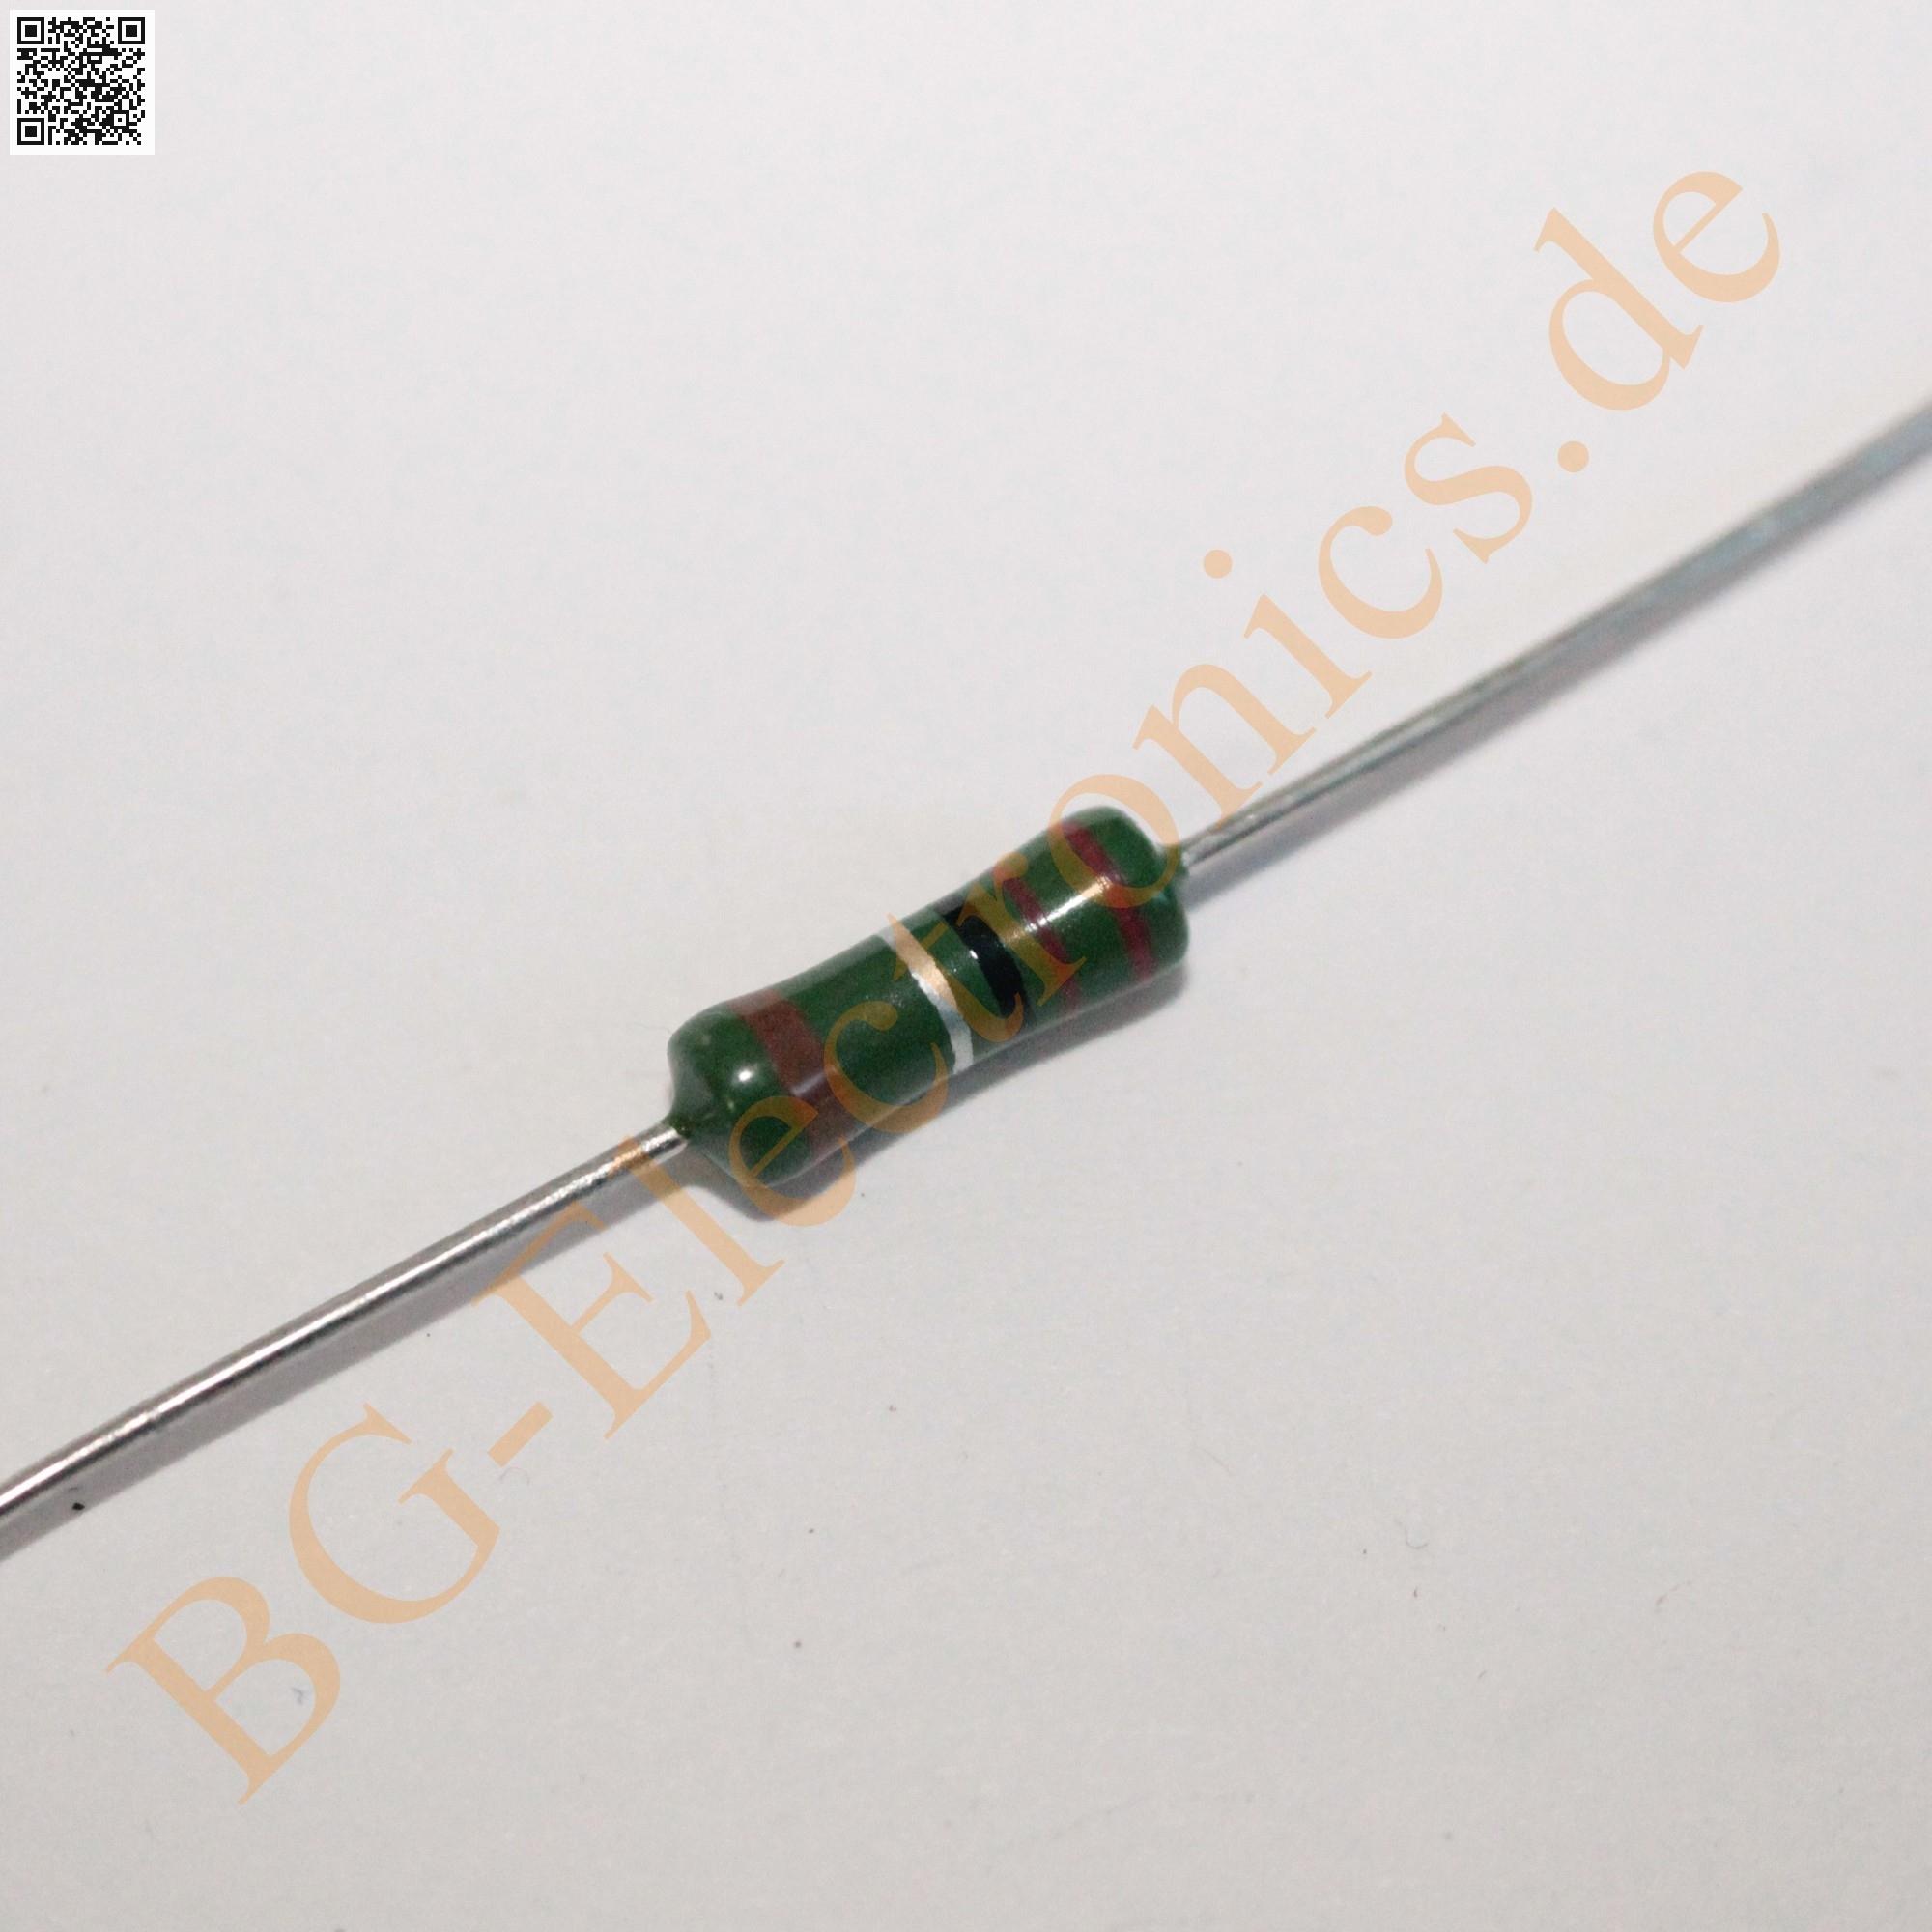 Lm350bt Bg Electronics Lm350t Lm350 3a Adjustable Regulator Using Electronic Circuits And 22 Watt